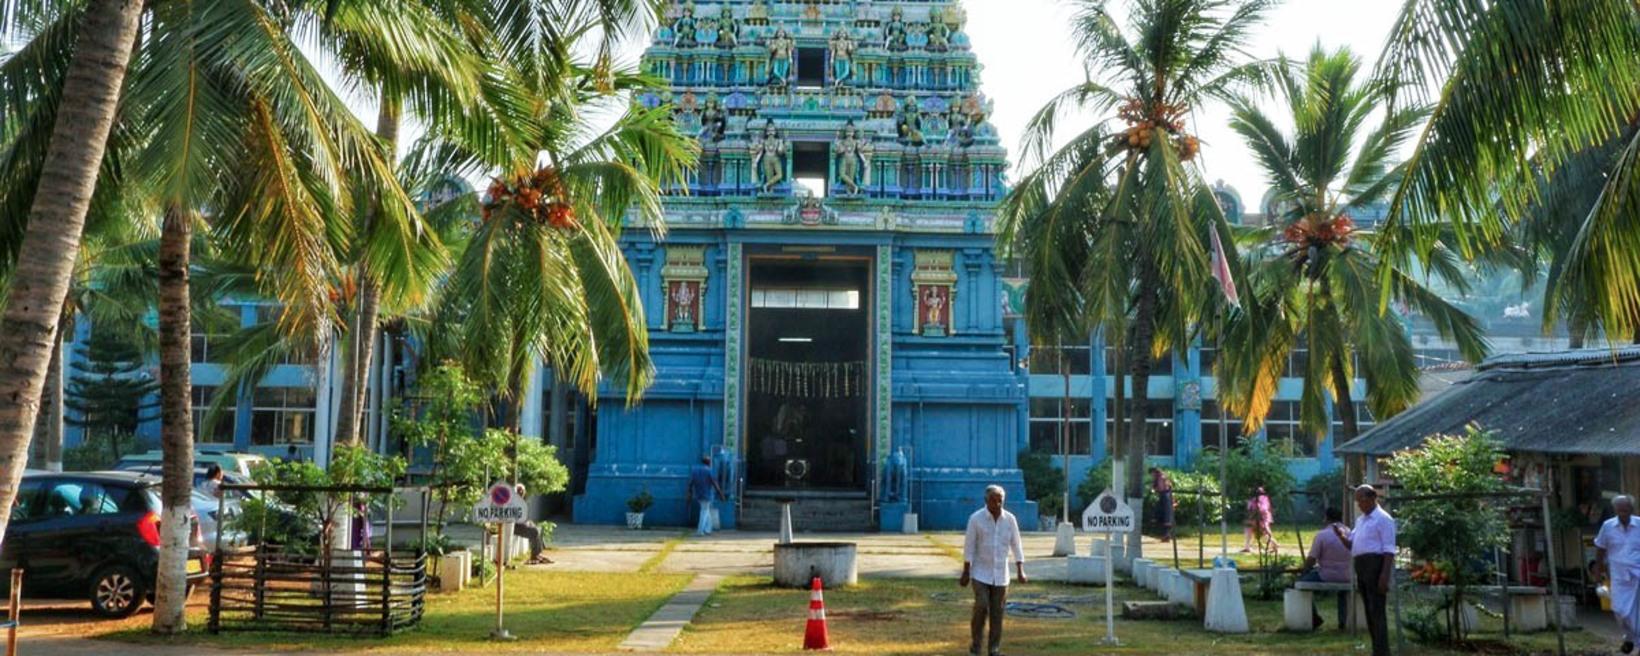 Old Kathiresan Temple, Colombo